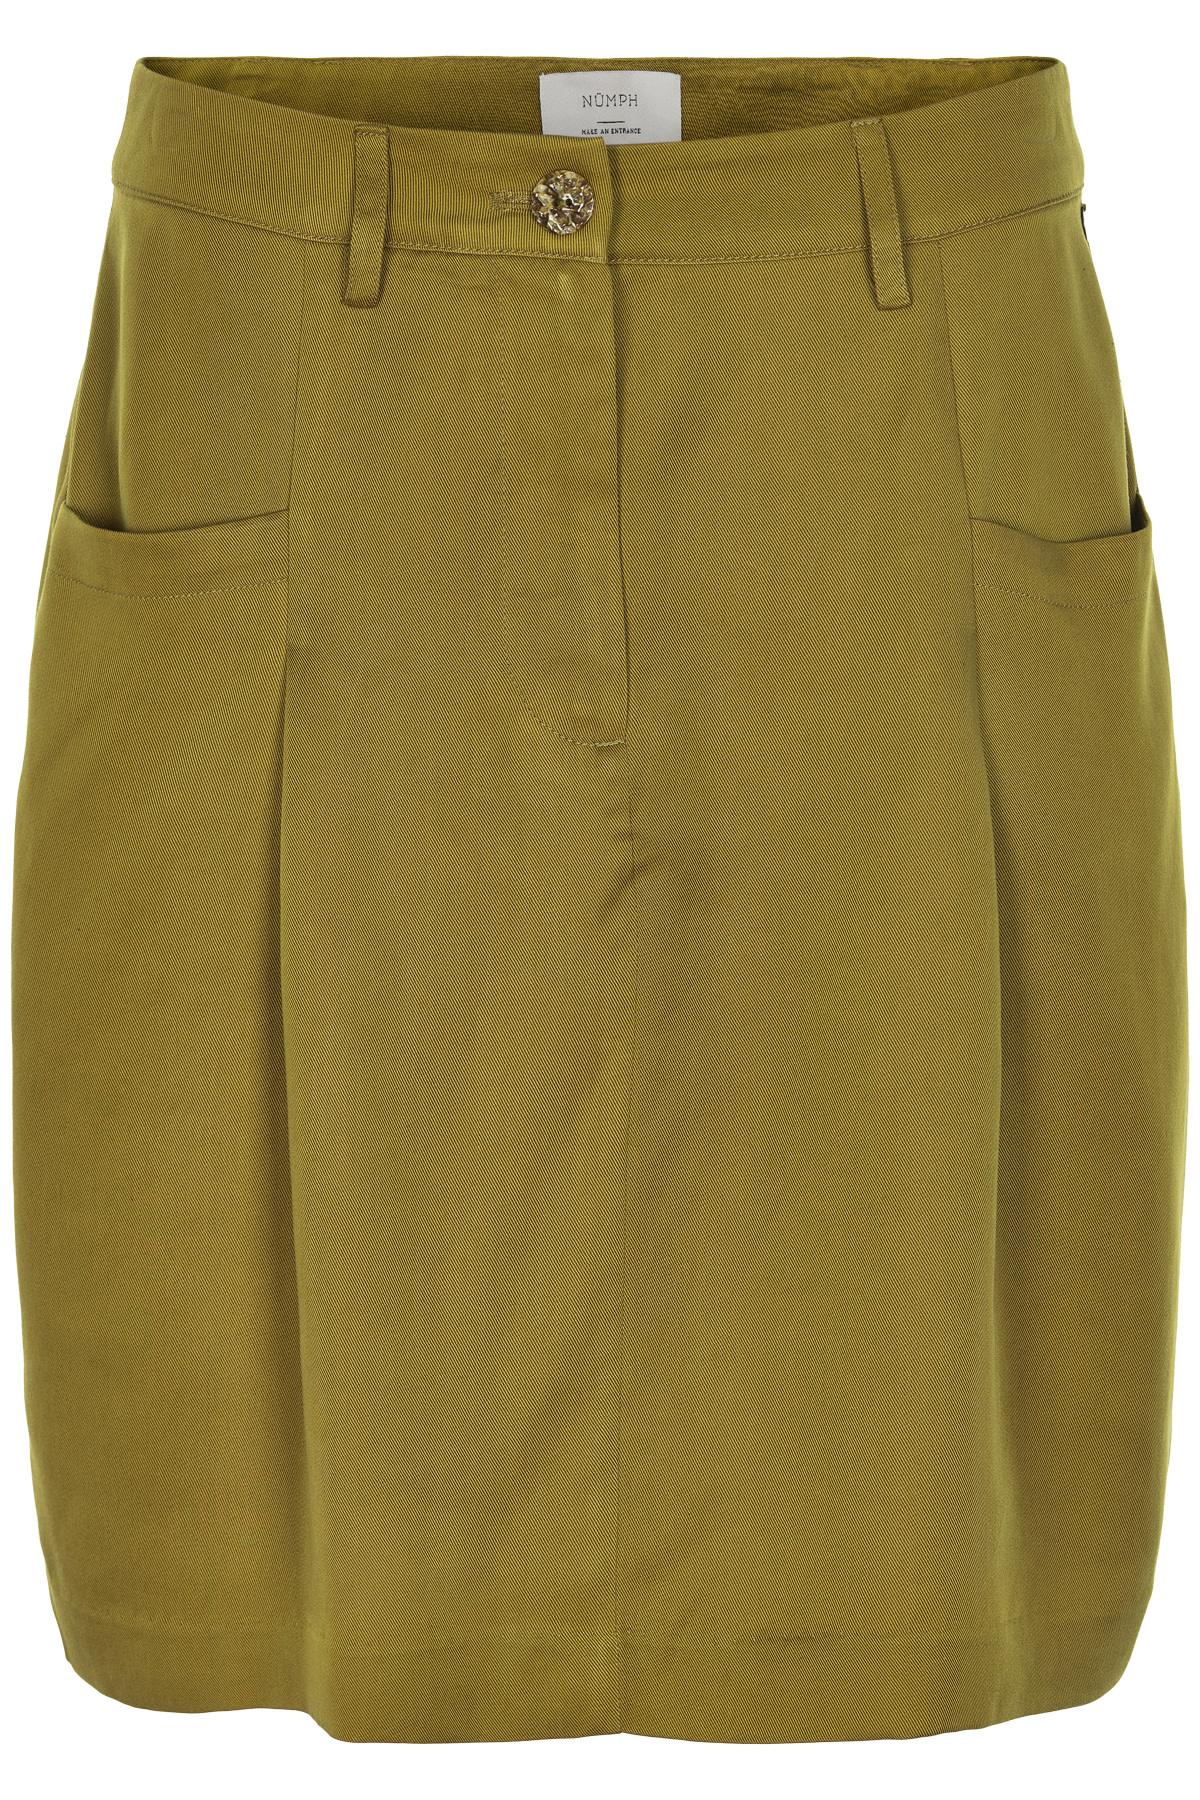 Nümph Maxwelle Skirt